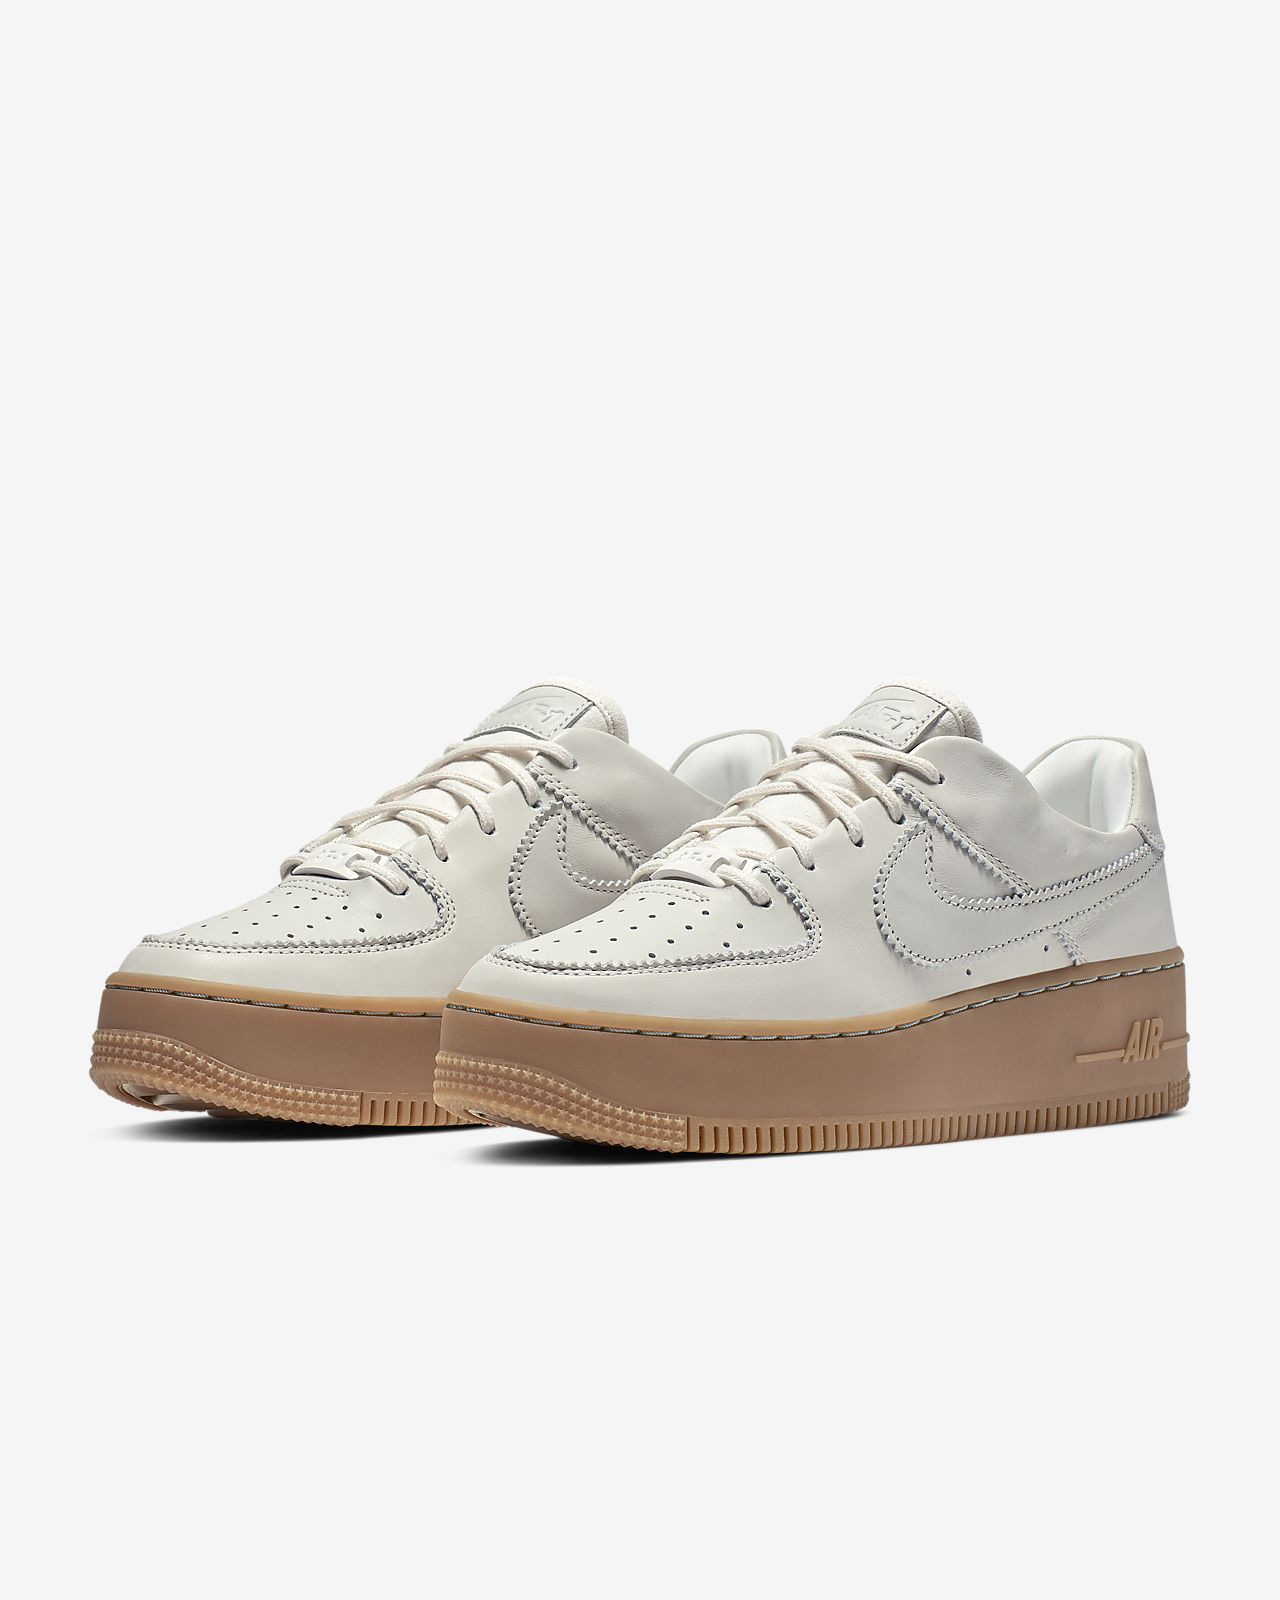 brand new 9a71f b3e45 ... Sko Nike Air Force 1 Sage Low LX för kvinnor